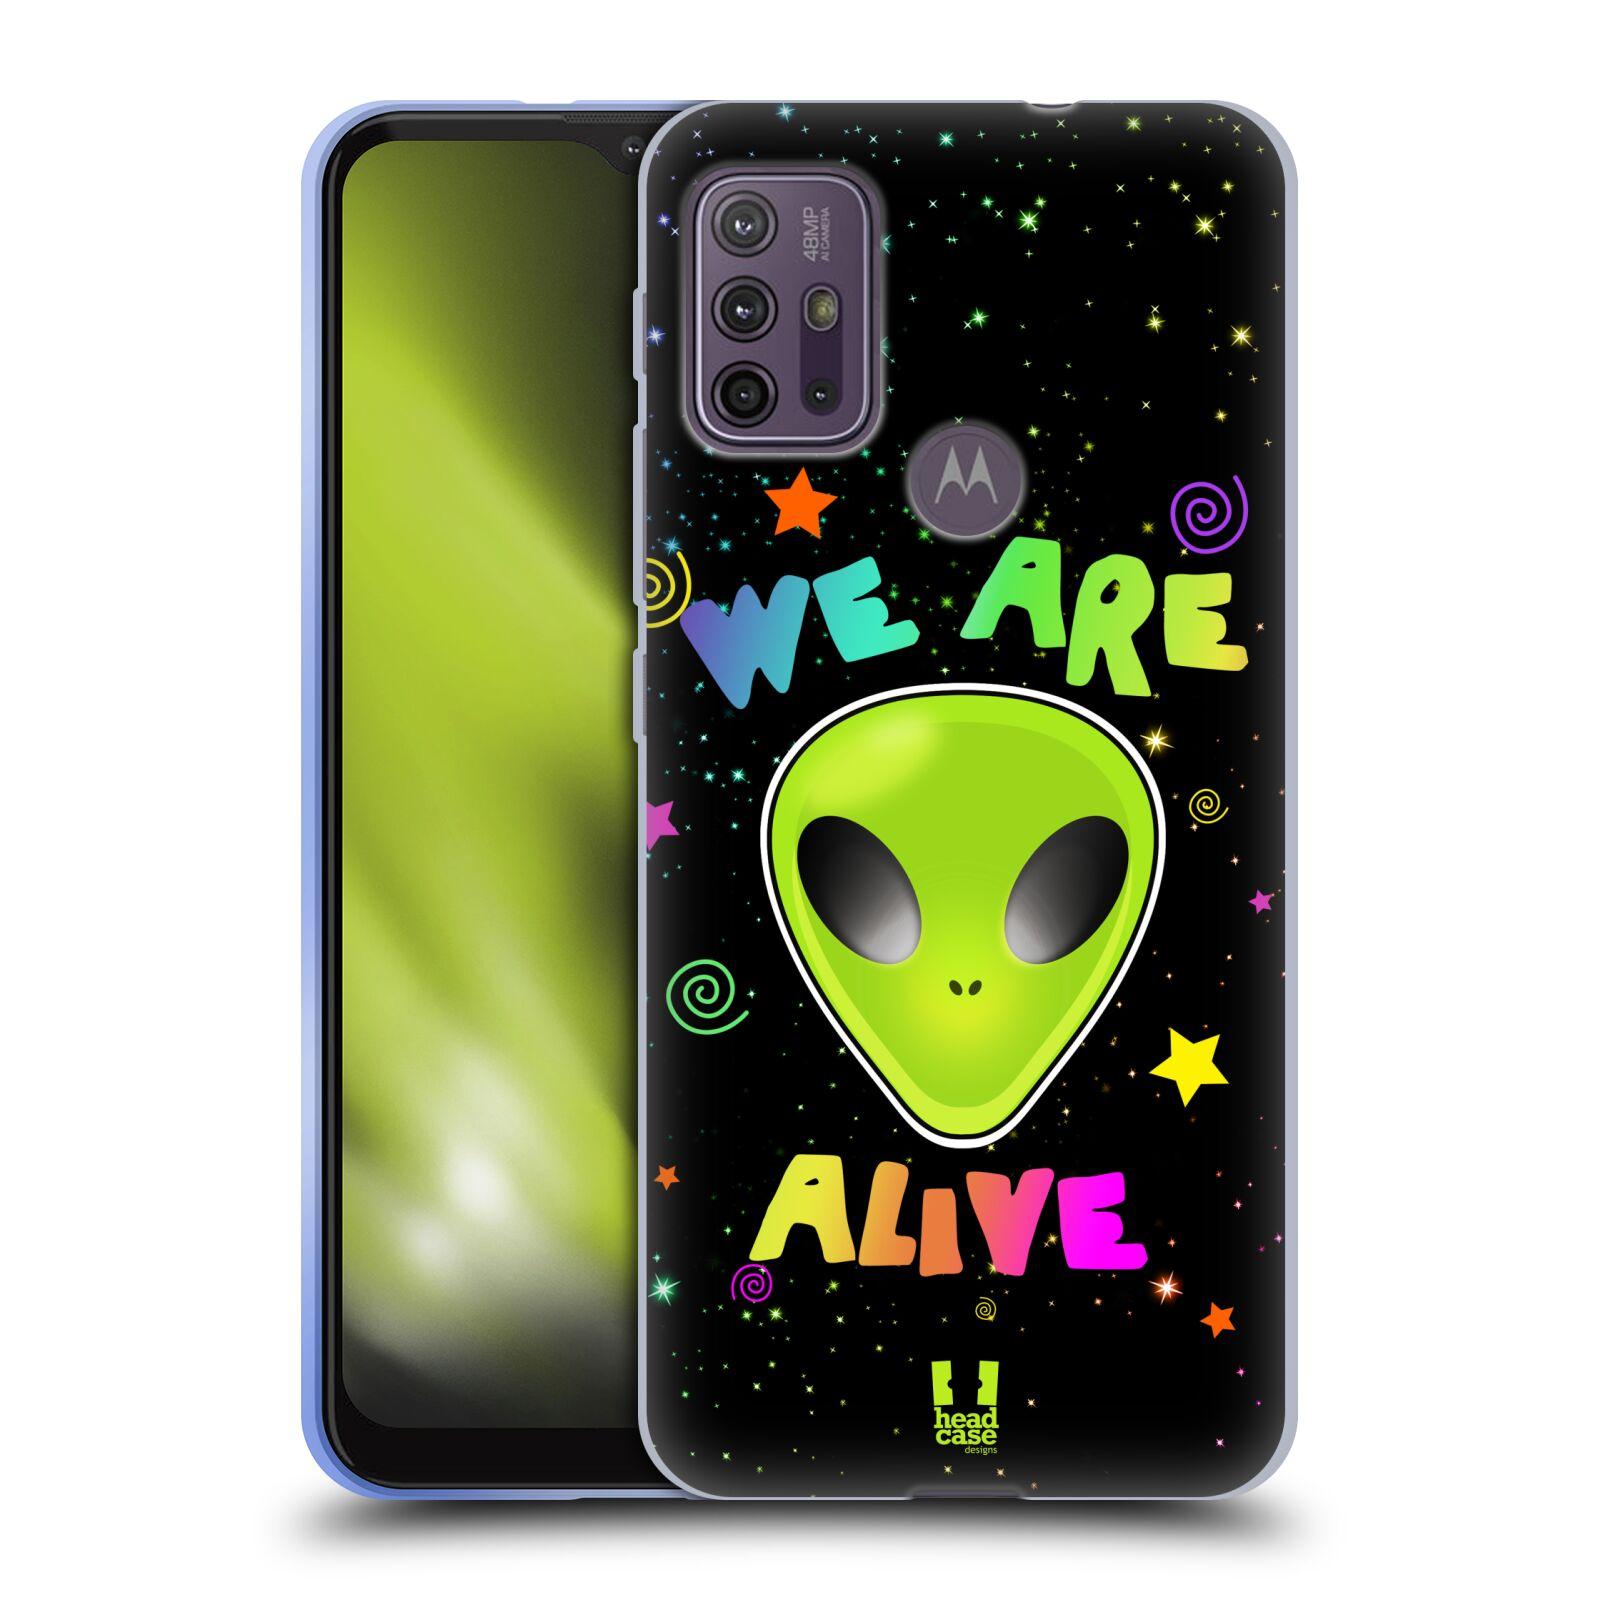 Silikonové pouzdro na mobil Motorola Moto G10 / G30 - Head Case - ALIENS ALIVE